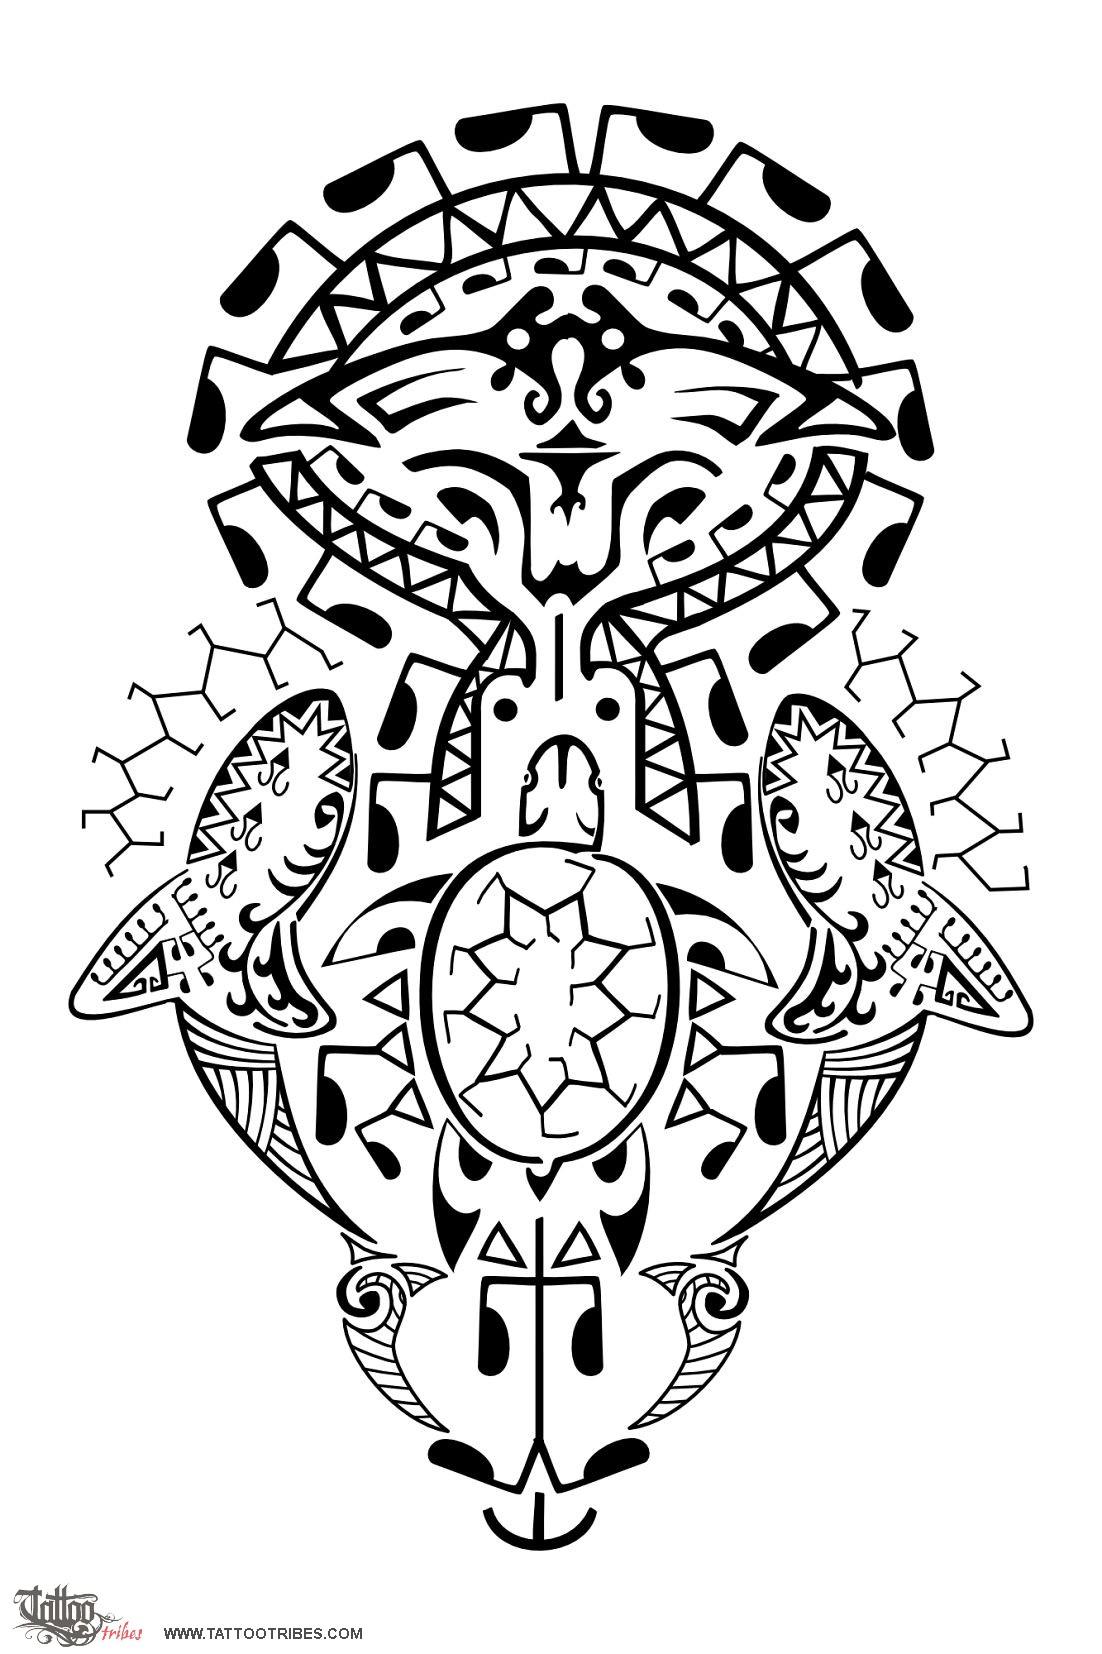 1102x1654 Tattoo Of Polynesian Ocean, Freedom, Voyage Tattoo